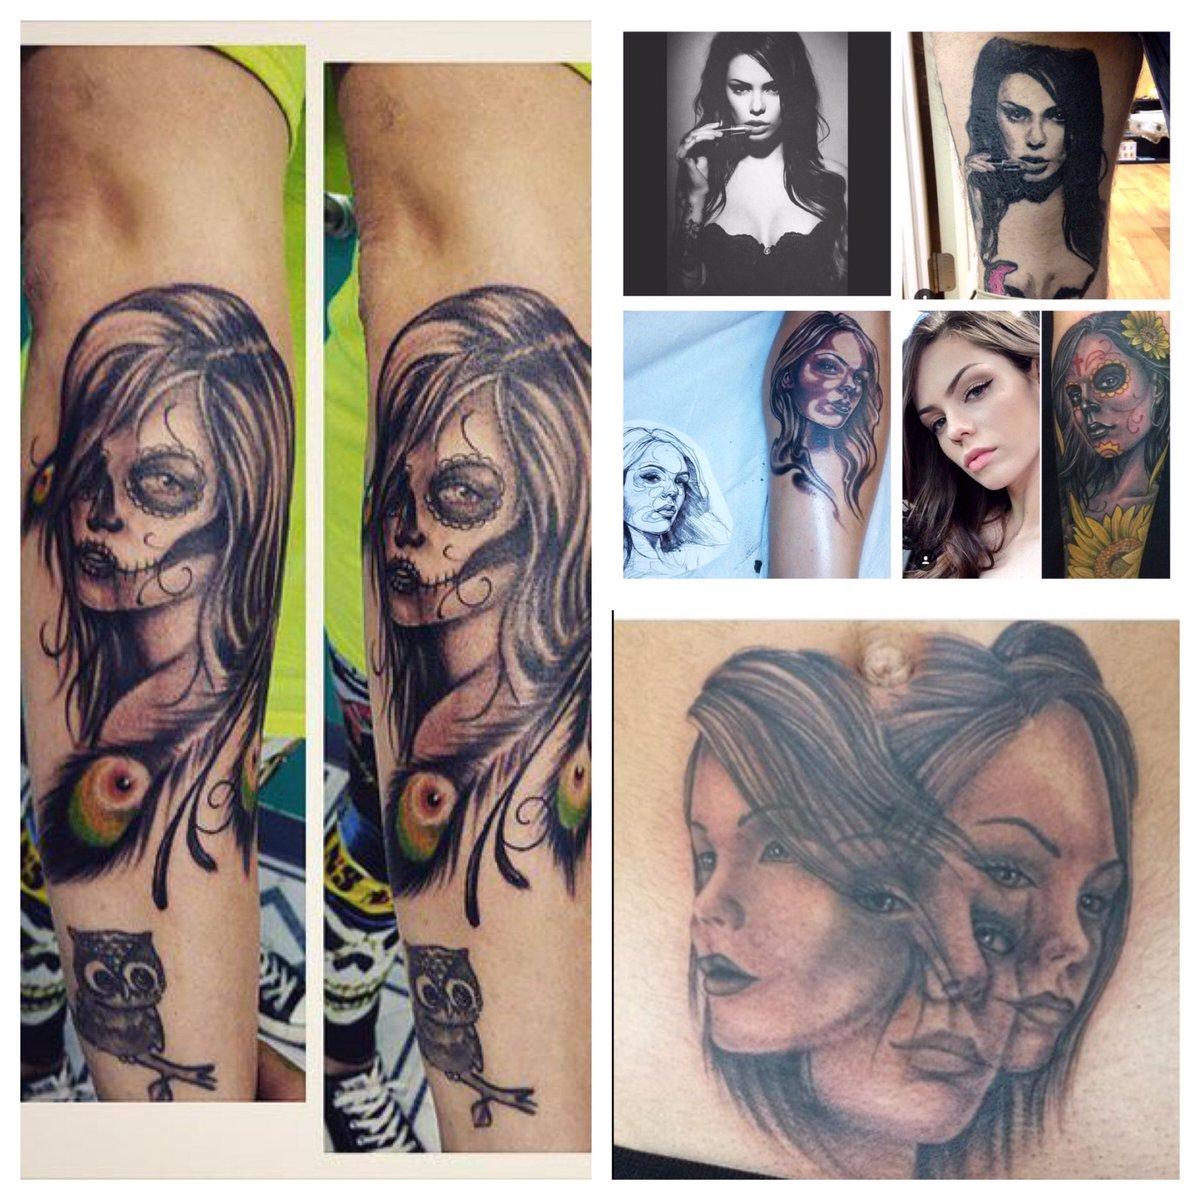 I still trip out I'm tattooed on people 😳🌟🙈😲 DiuM9eYe5n